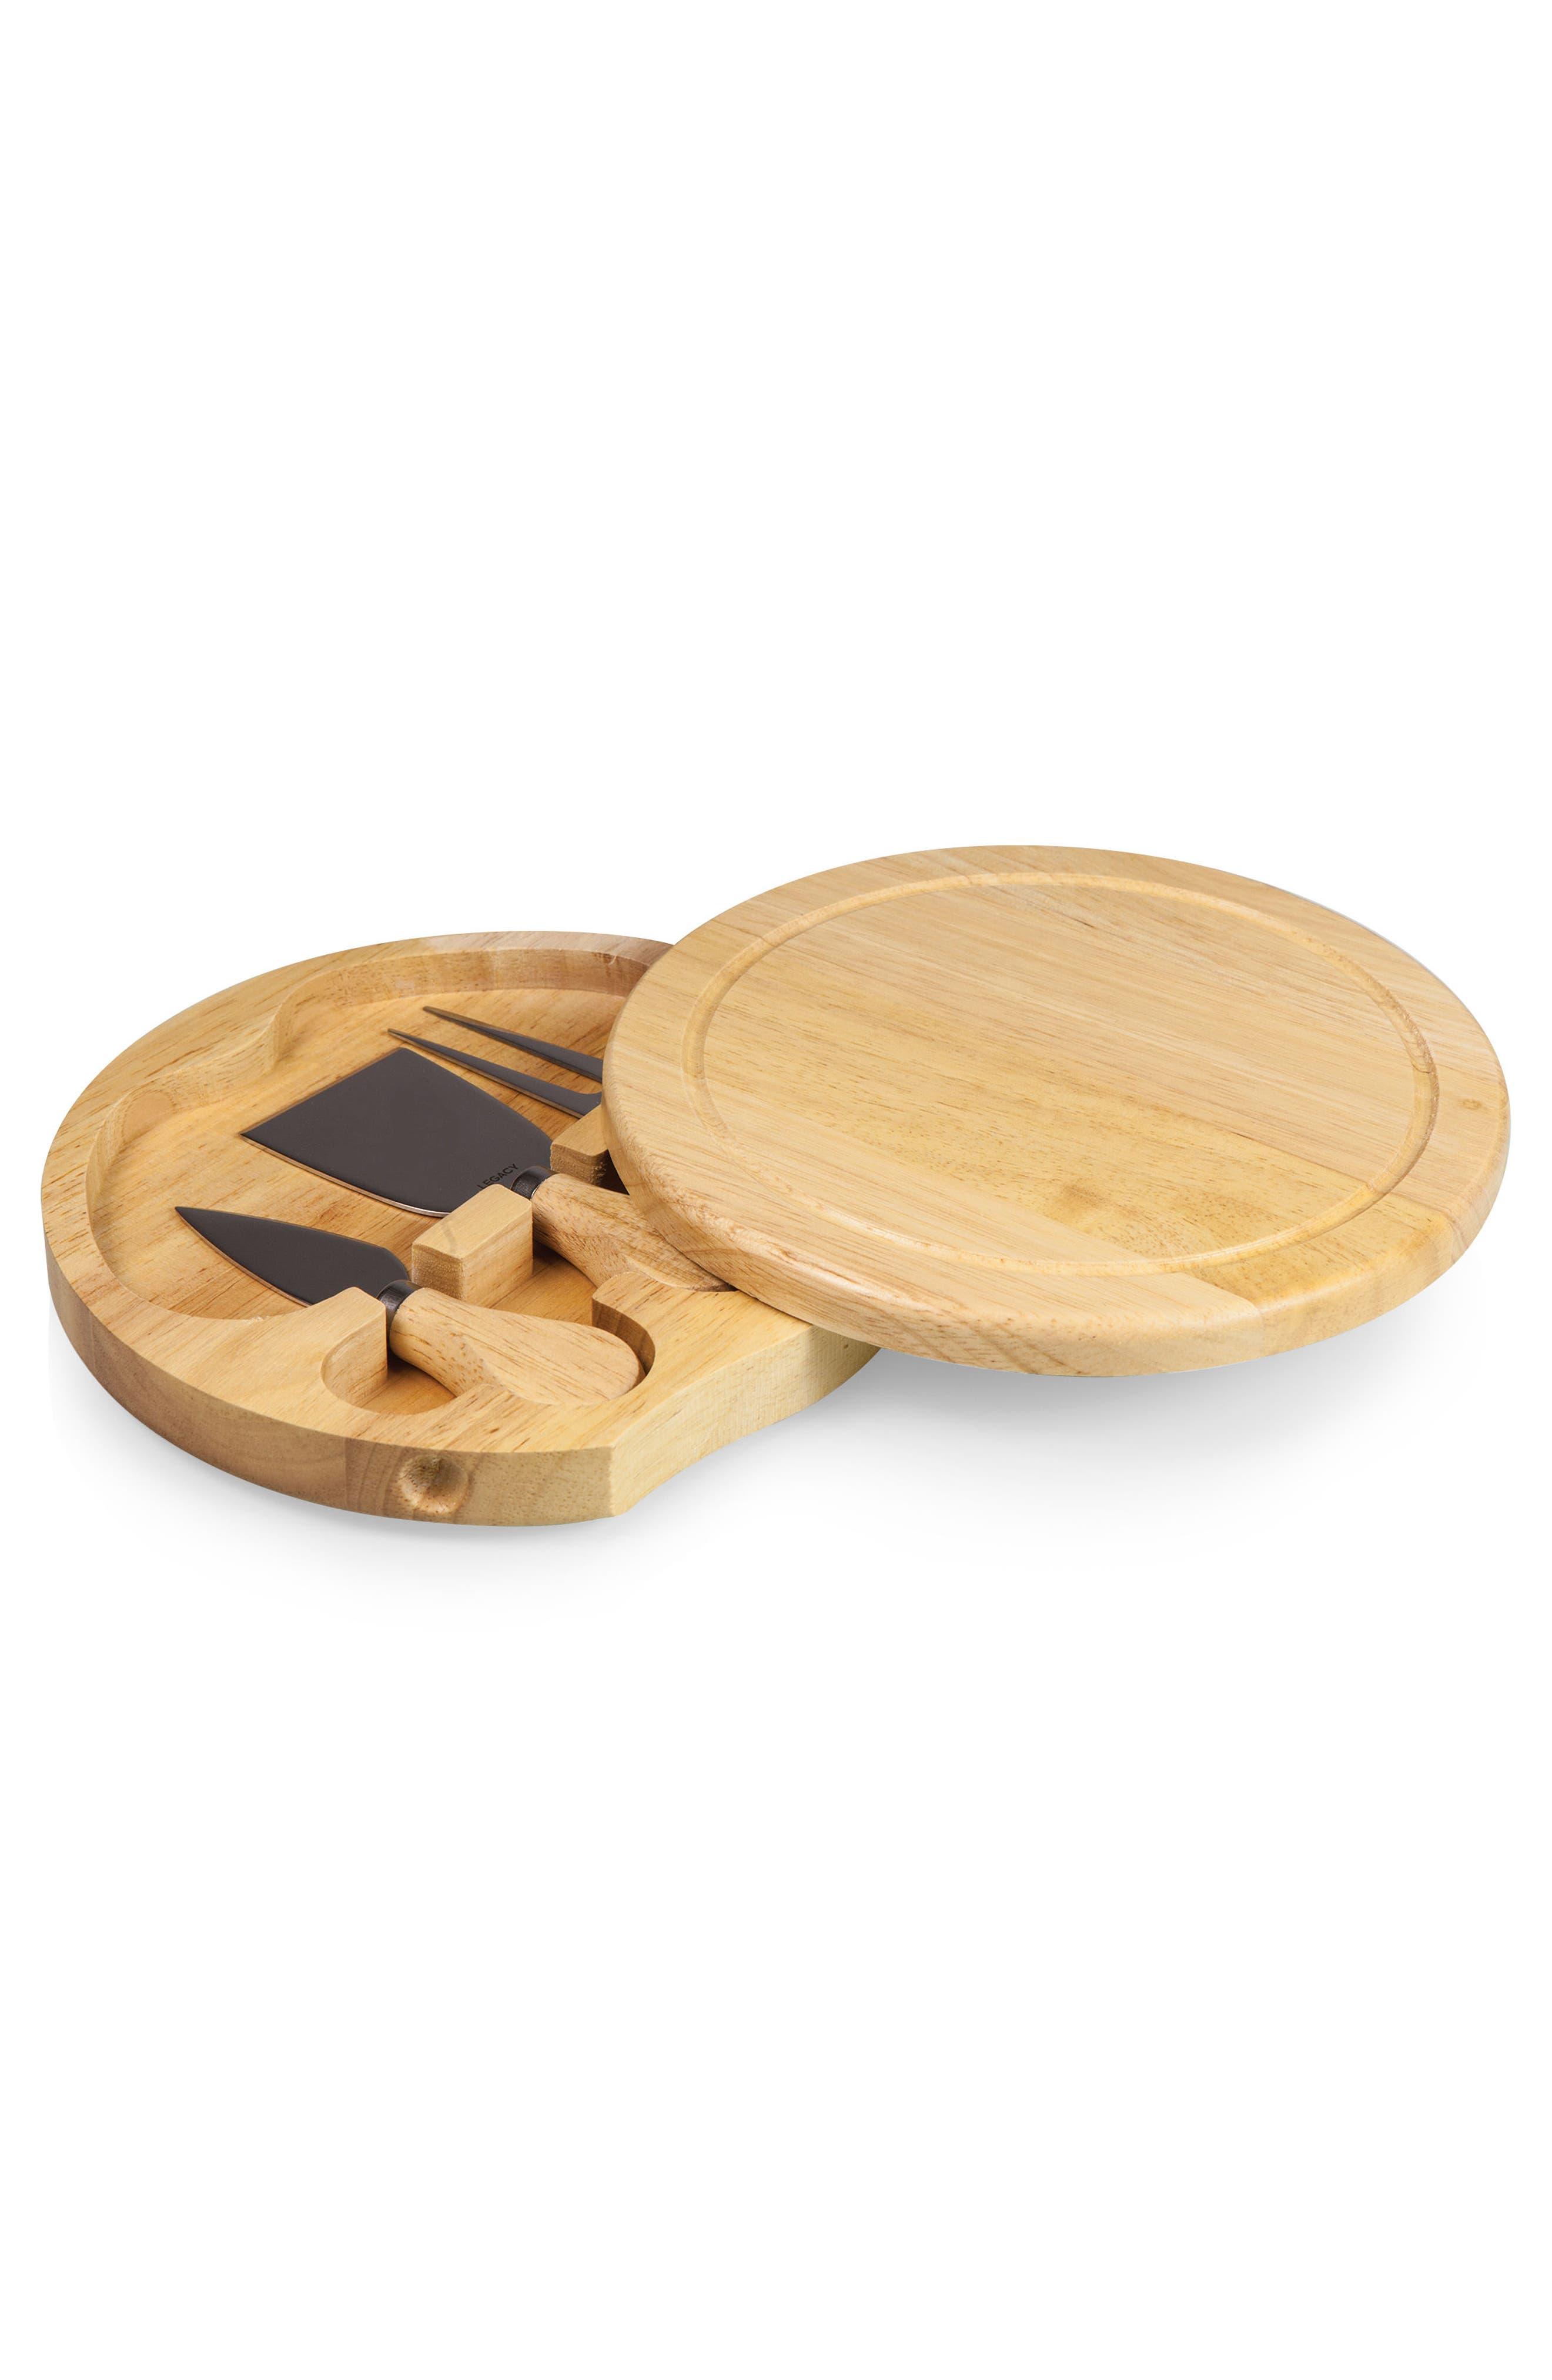 Rubberwood Cheese Board & Tools Set,                             Alternate thumbnail 2, color,                             200